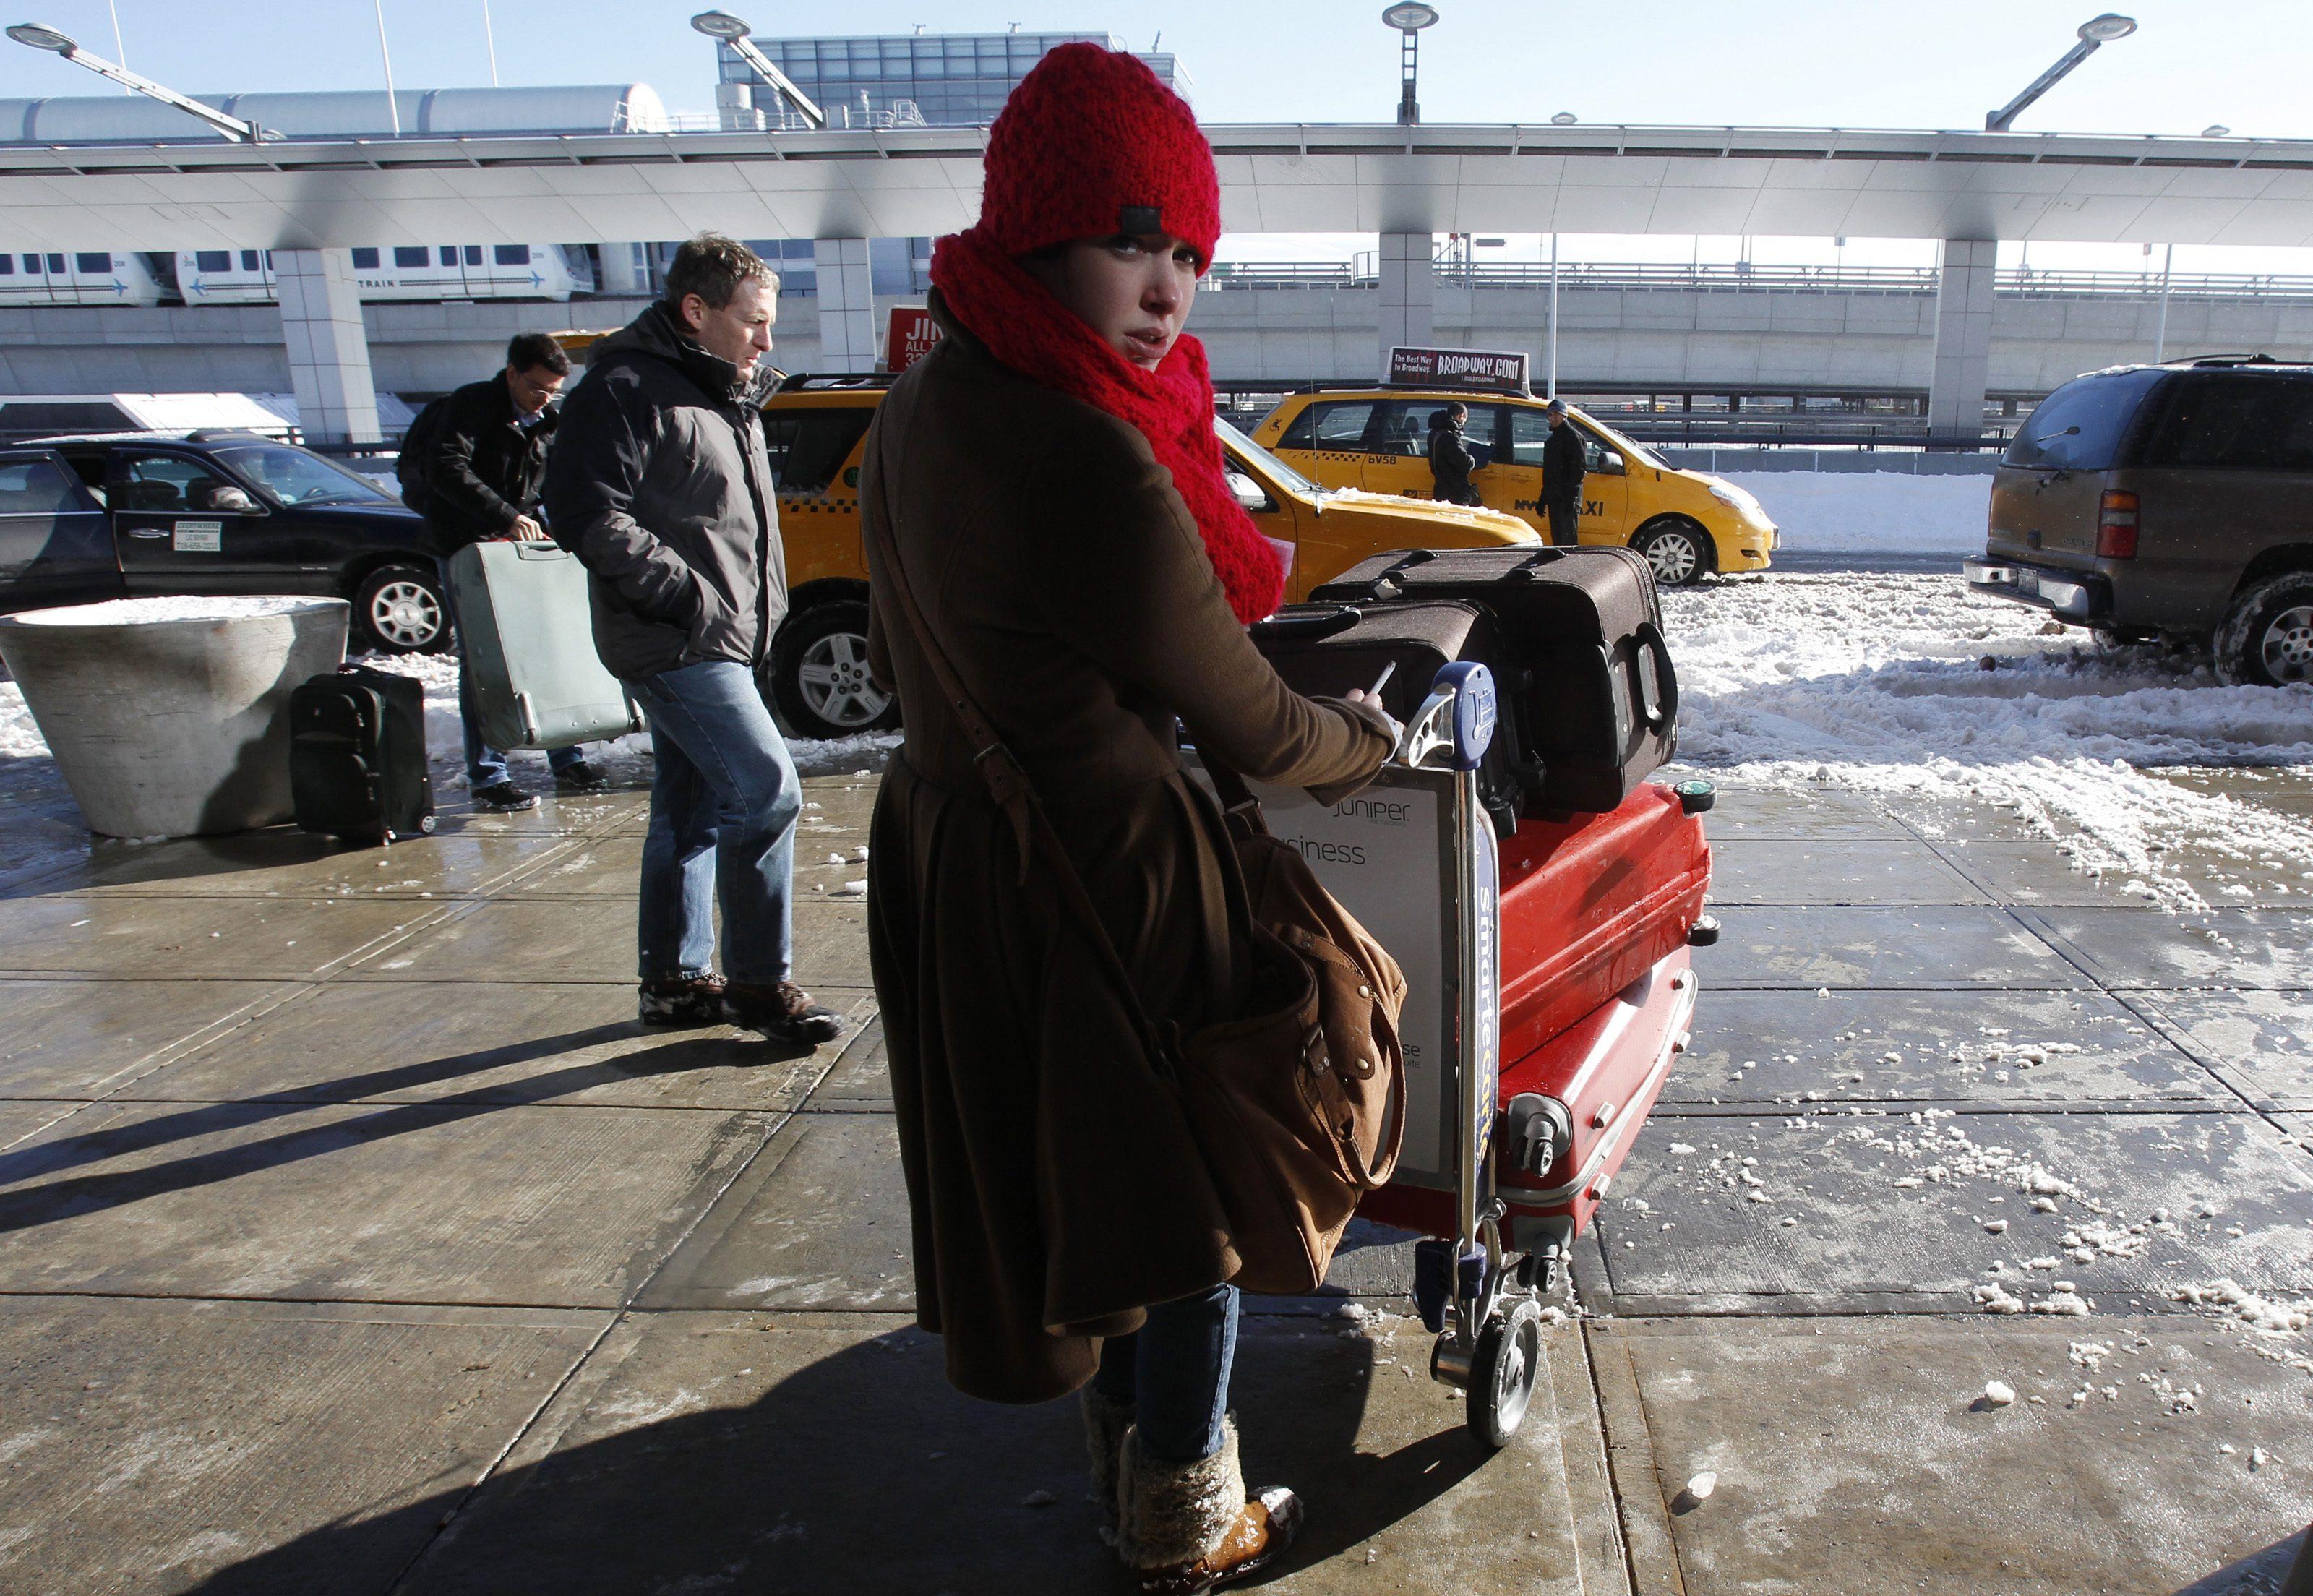 A woman arrives at JFK International Airport